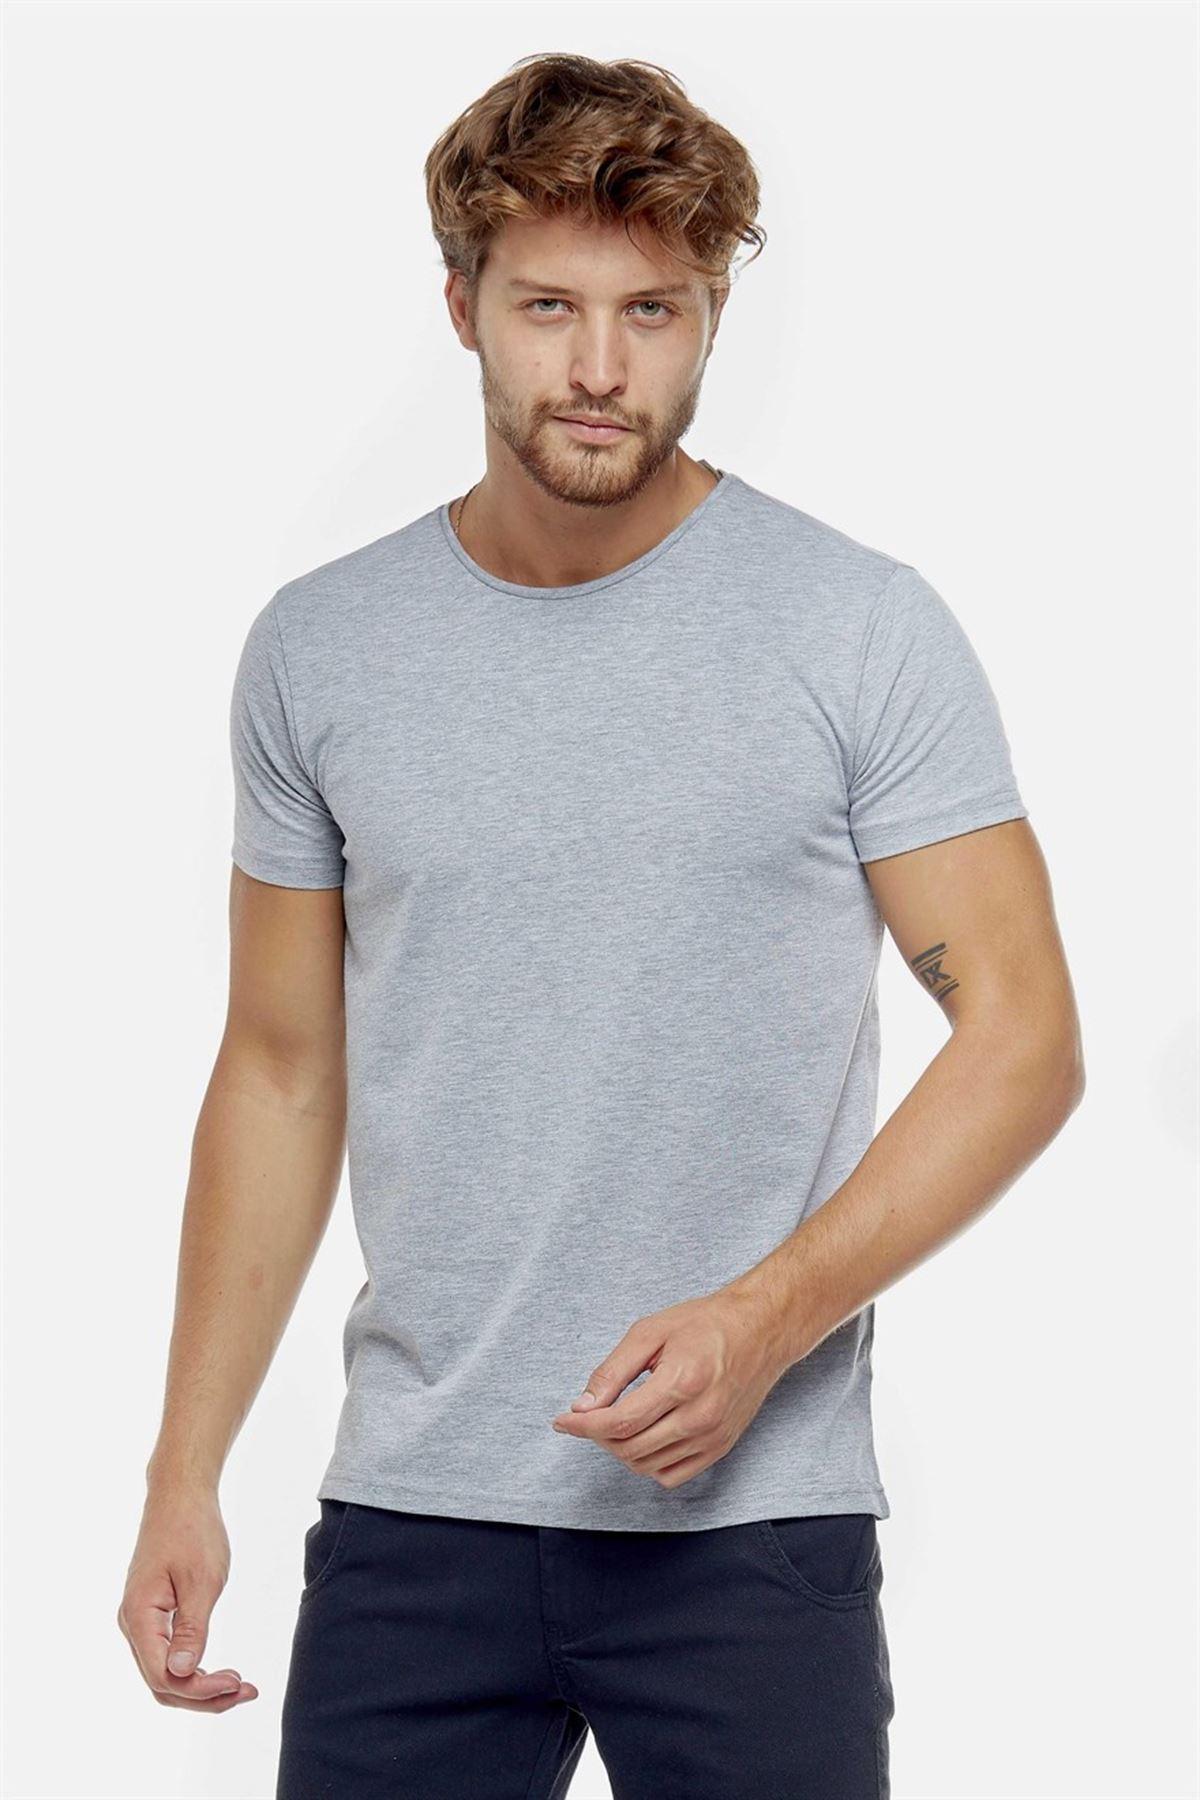 Erkek Gri Bisiklet Yaka Basic Body Düz Tişört Tshirt